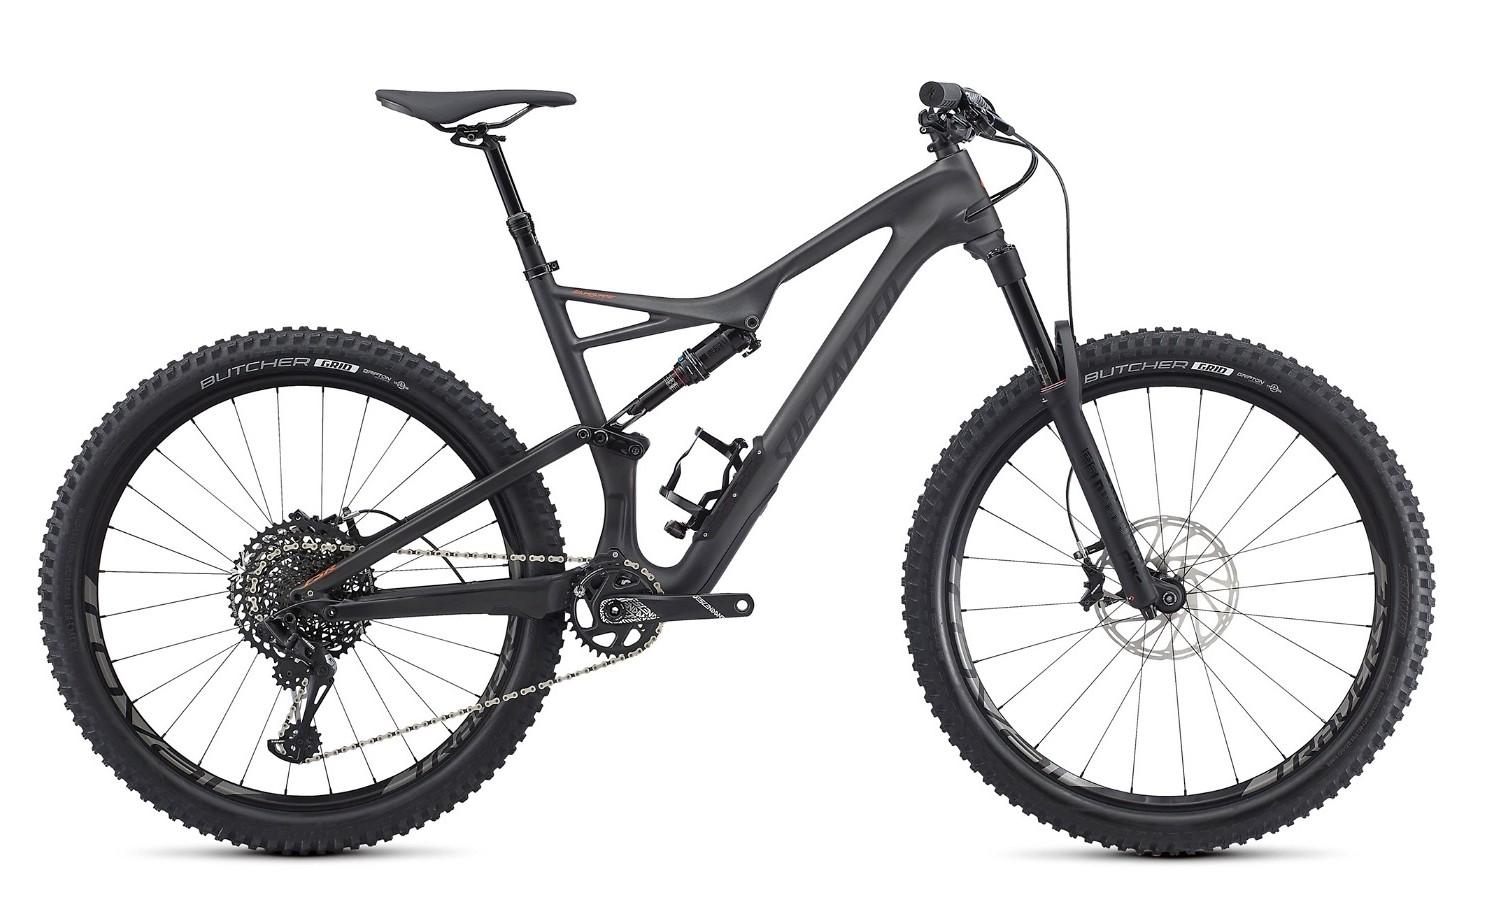 2018 Specialized Stumpjumper Expert 11m 27.5 Bike